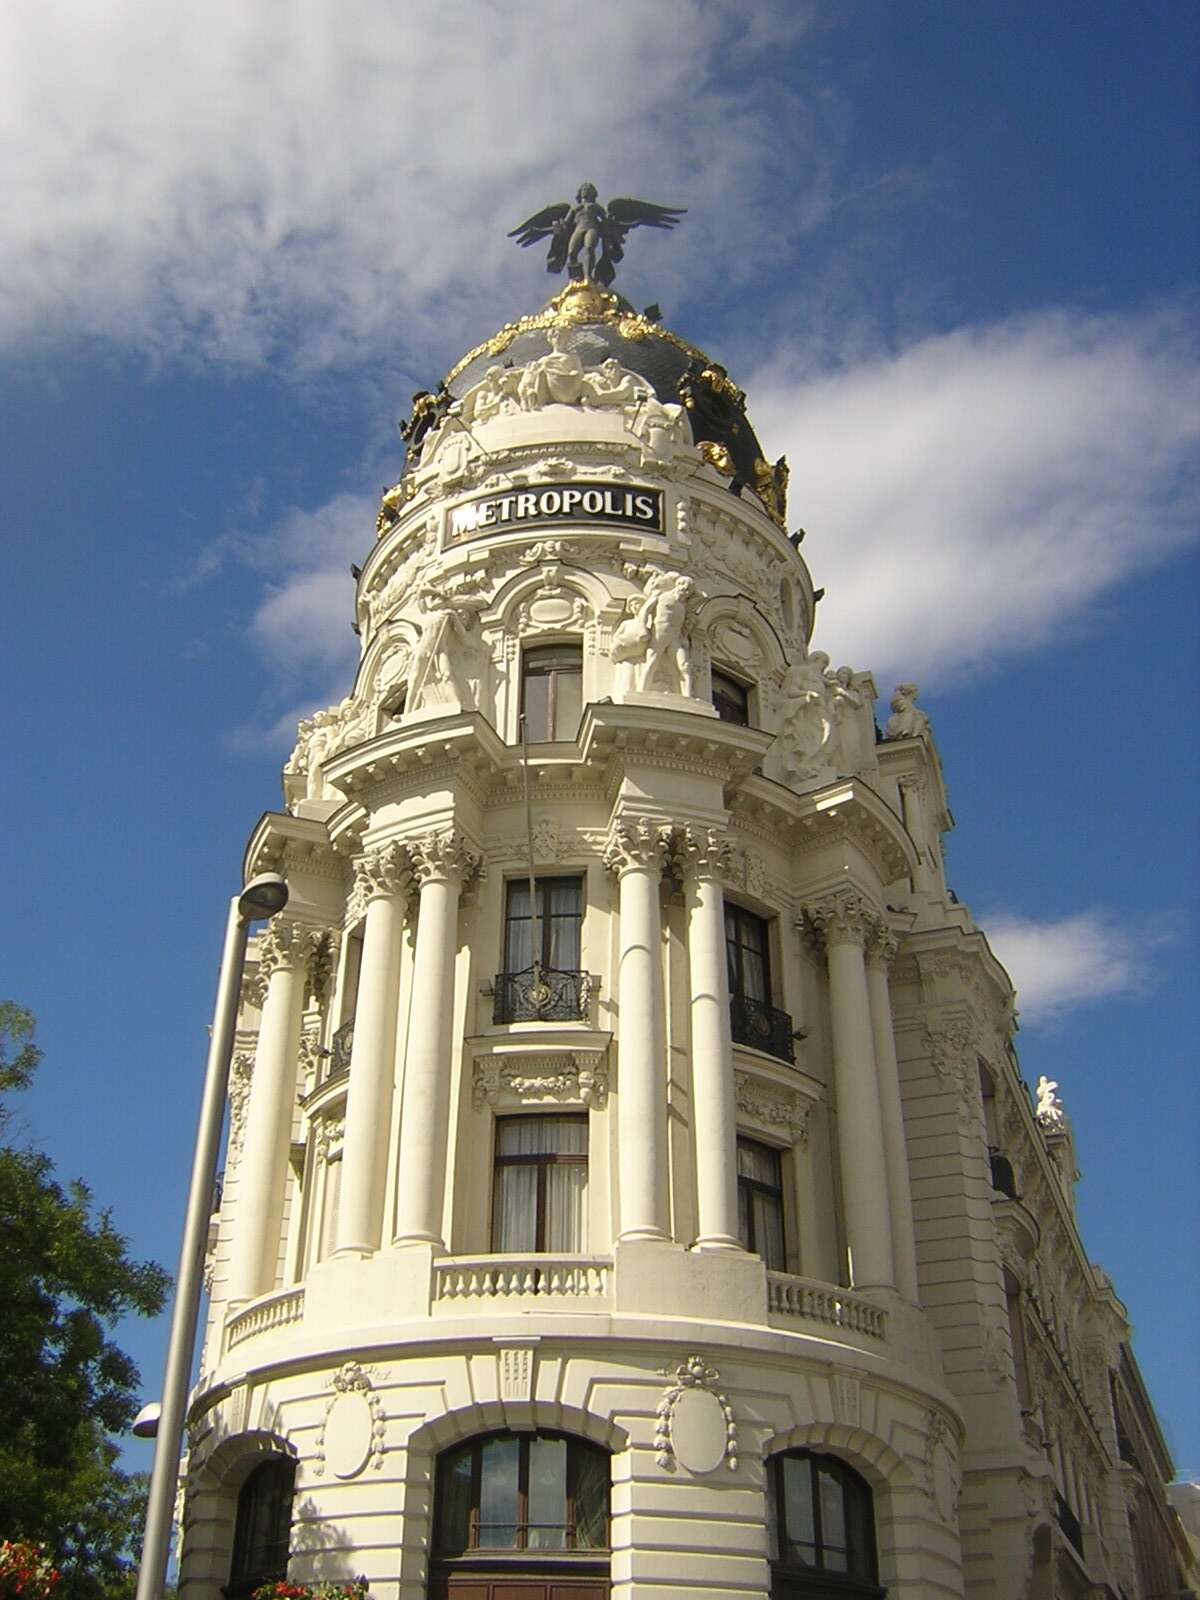 Edifício Metropolis - Madri